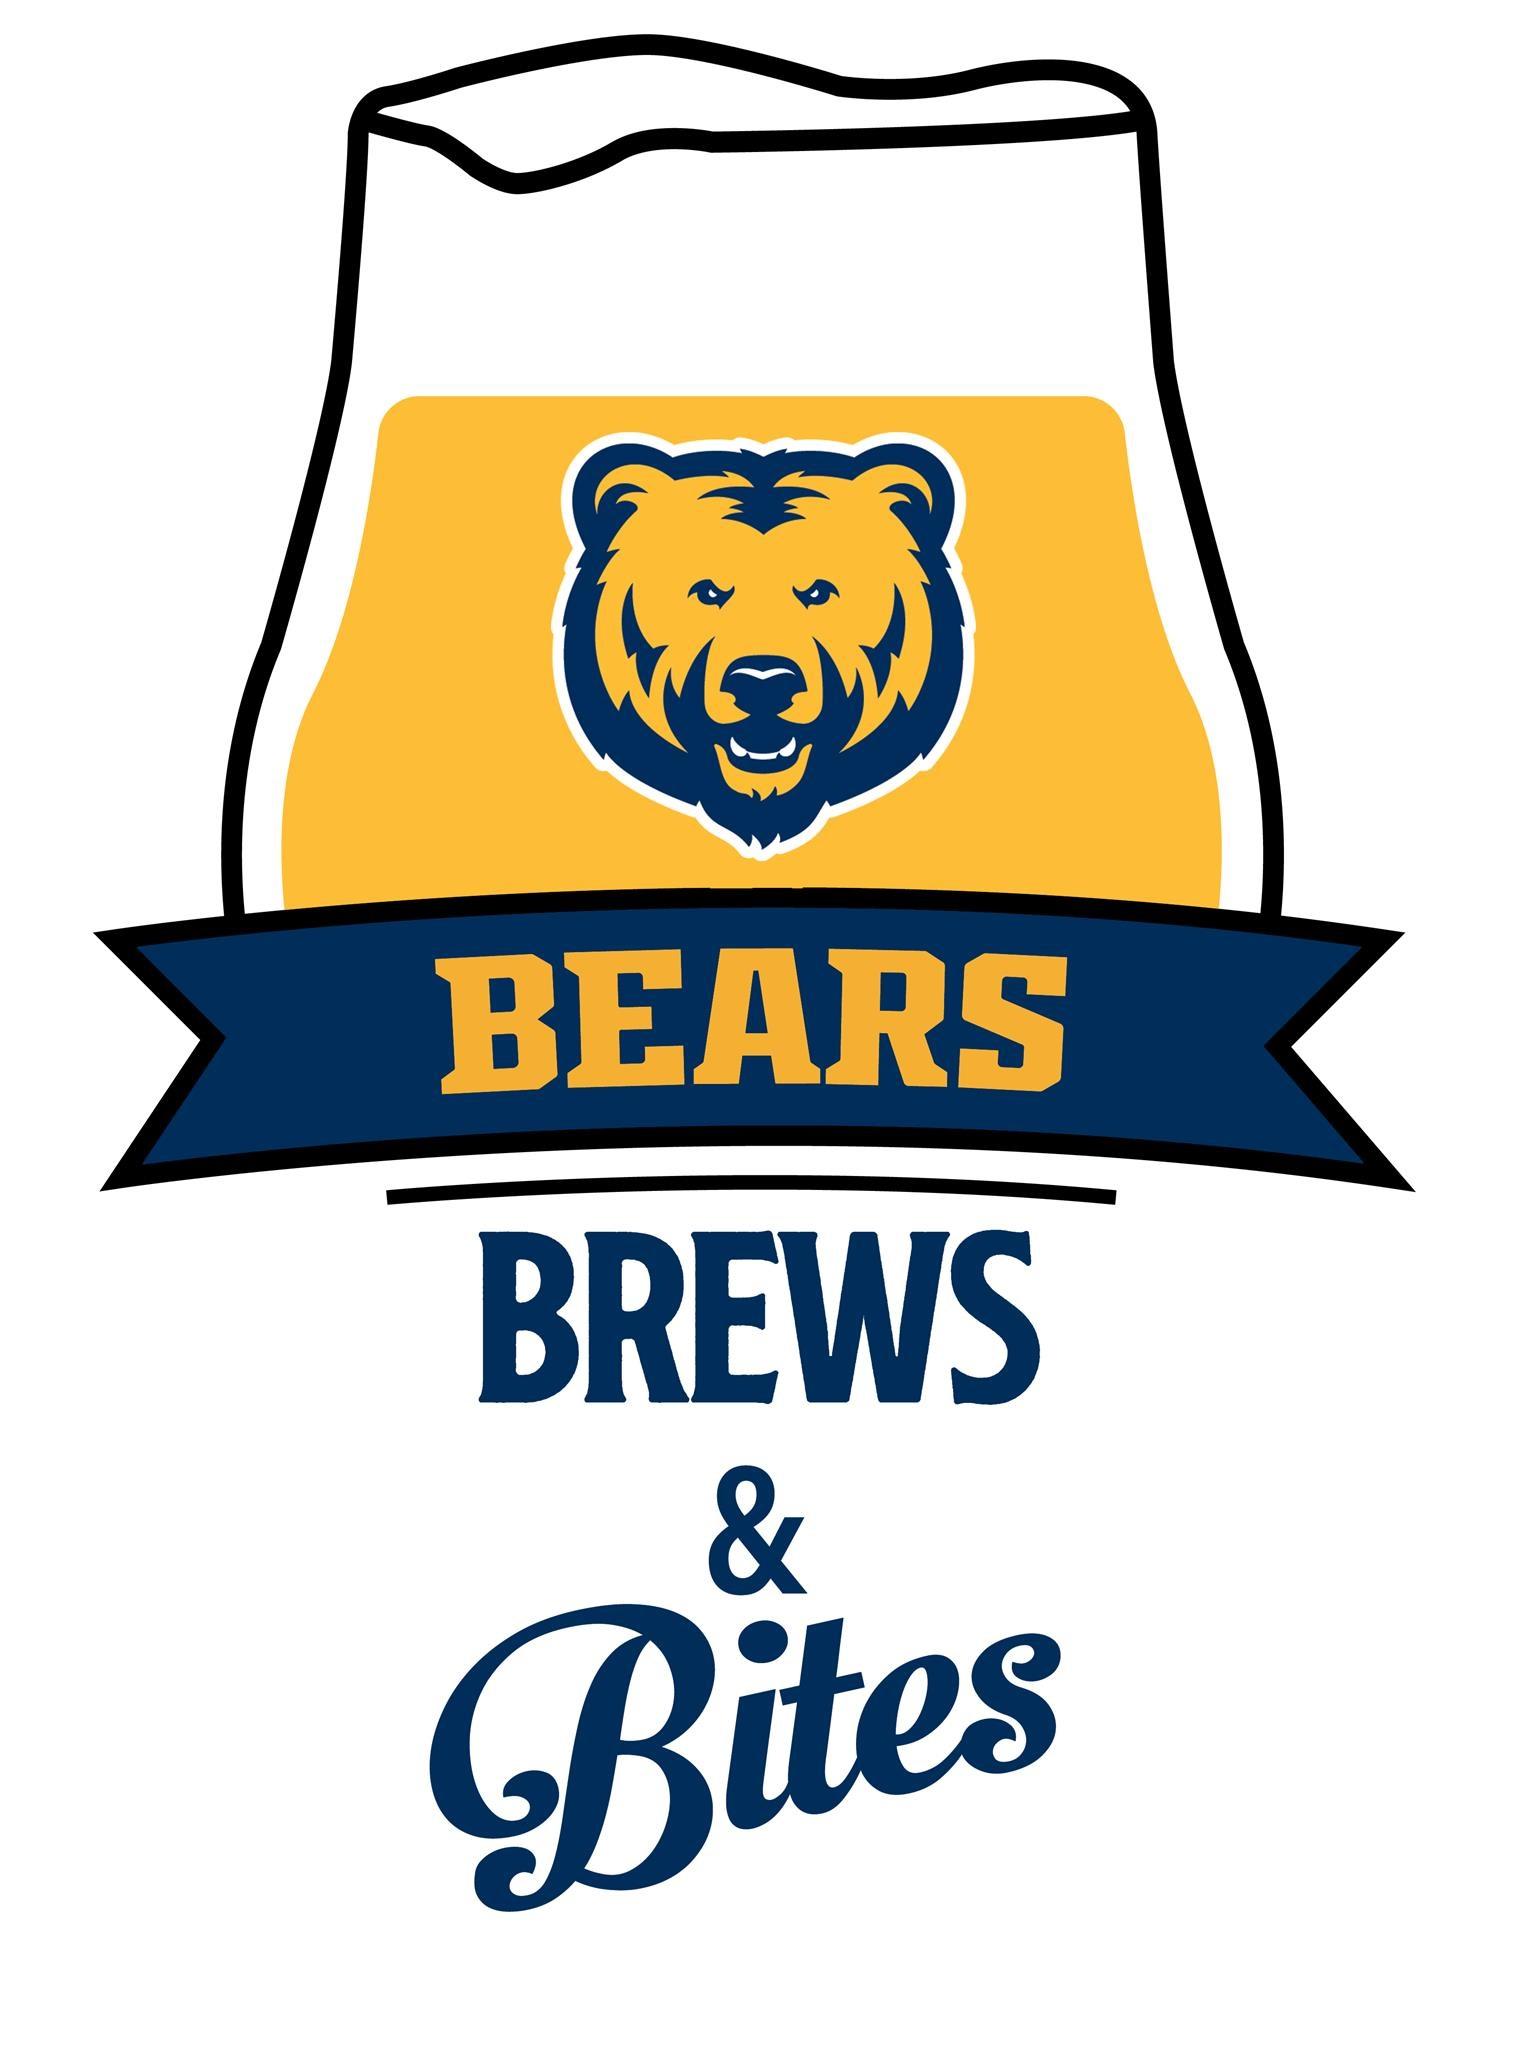 Bears Brews and Bites.